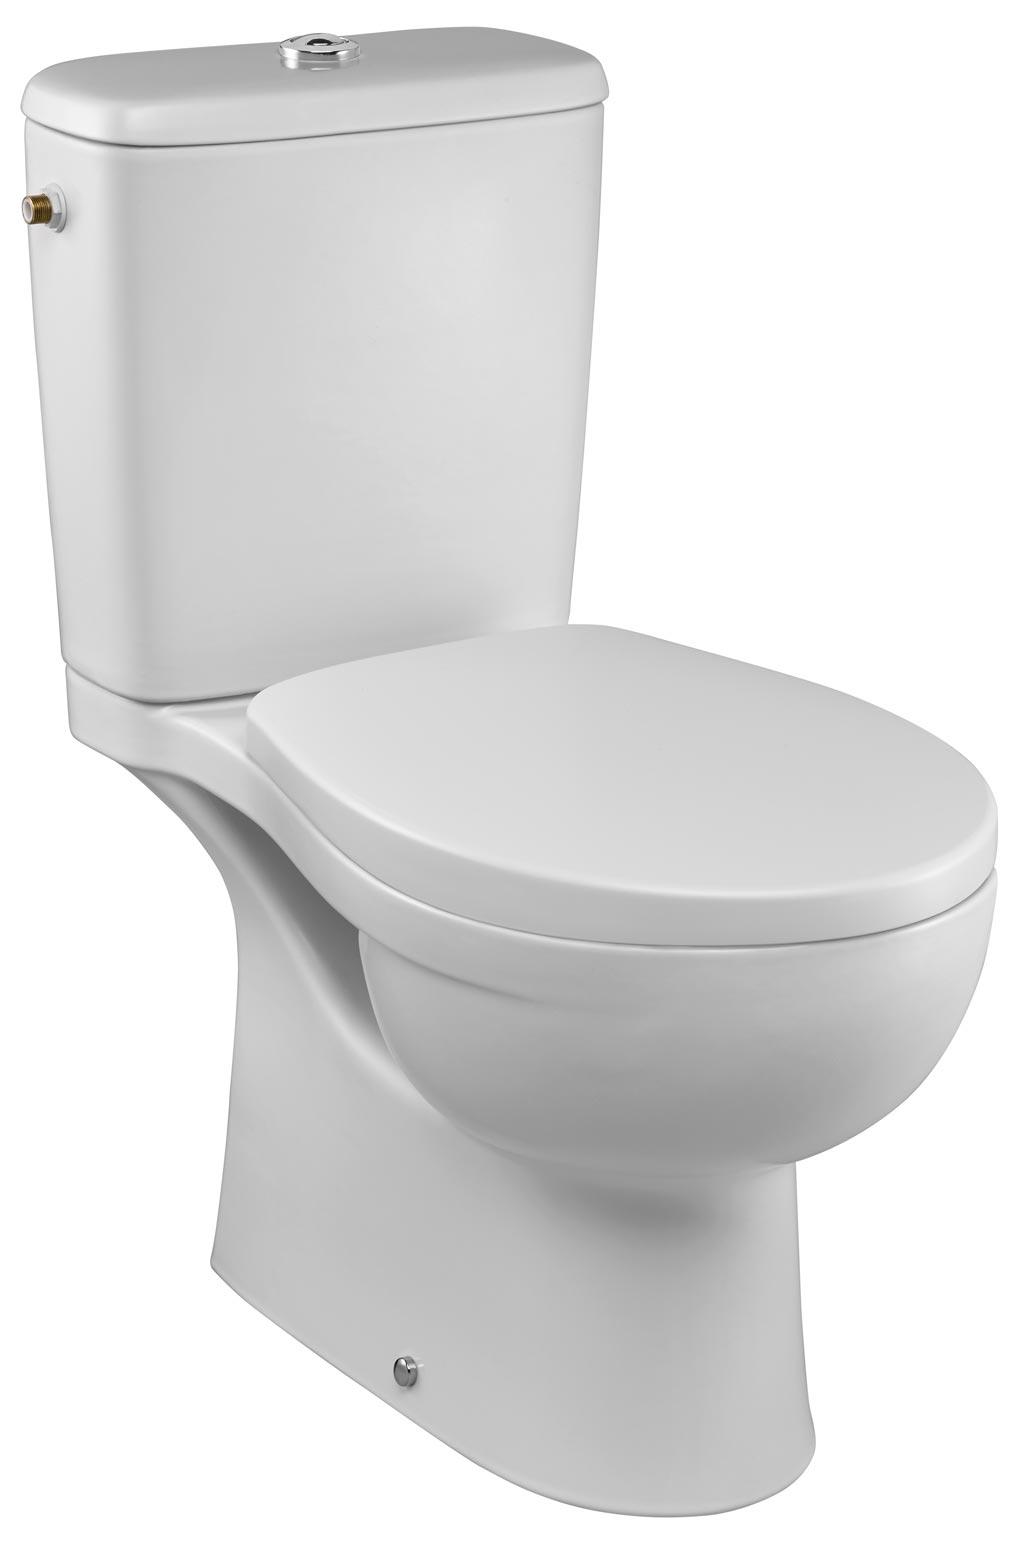 jacob de la fon great kohler jacob delafon fleur toilet k. Black Bedroom Furniture Sets. Home Design Ideas